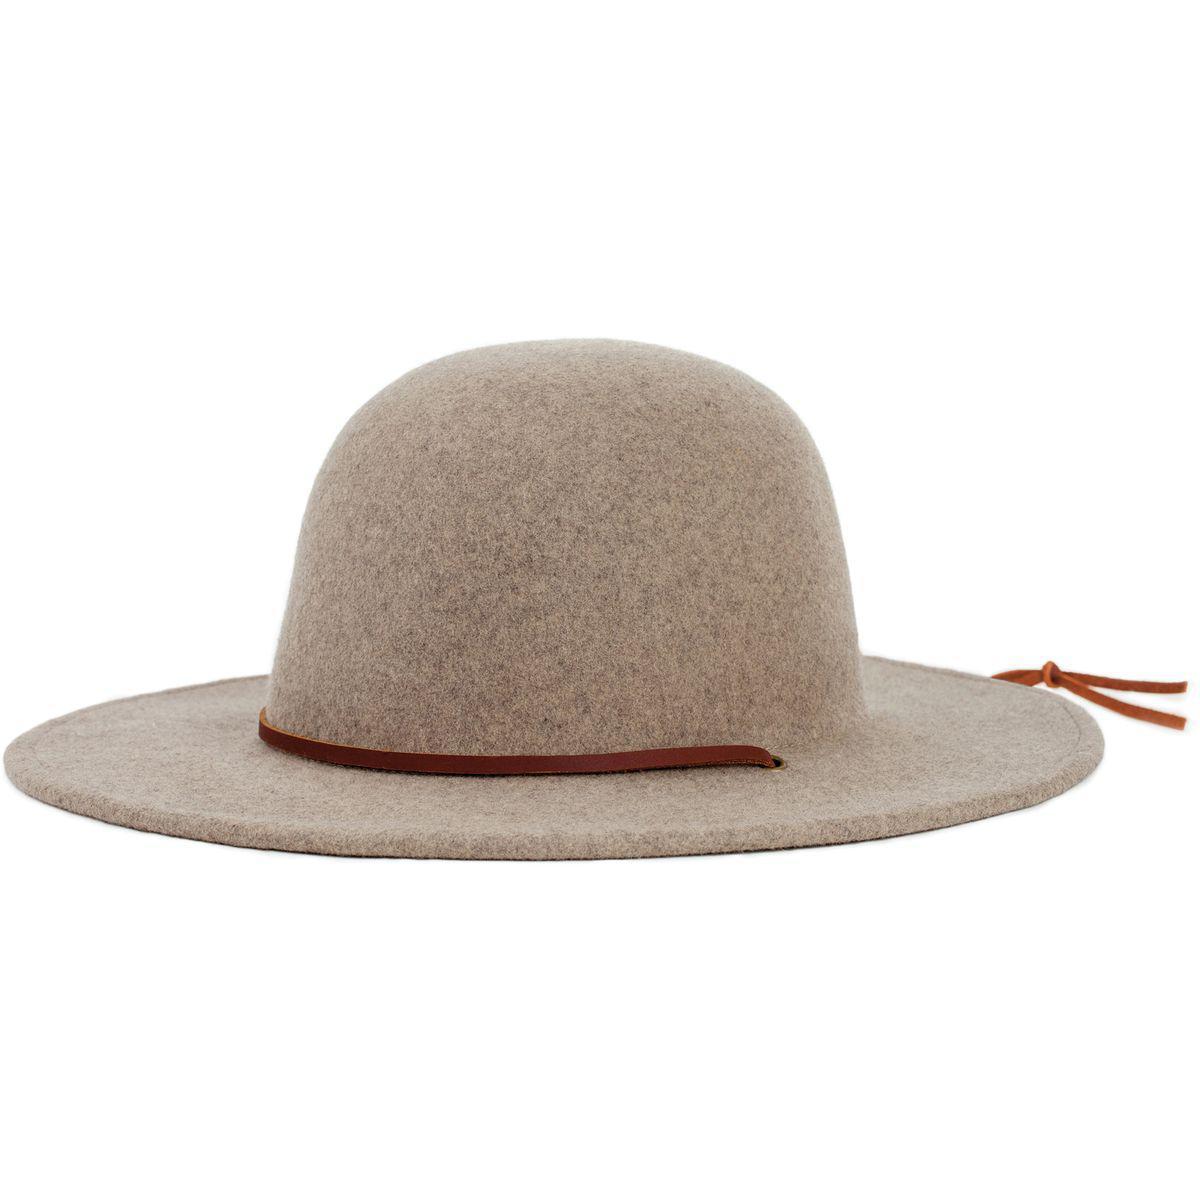 871c43b56e2c8 ... germany lyst brixton tiller hat in natural f1efa eaa96